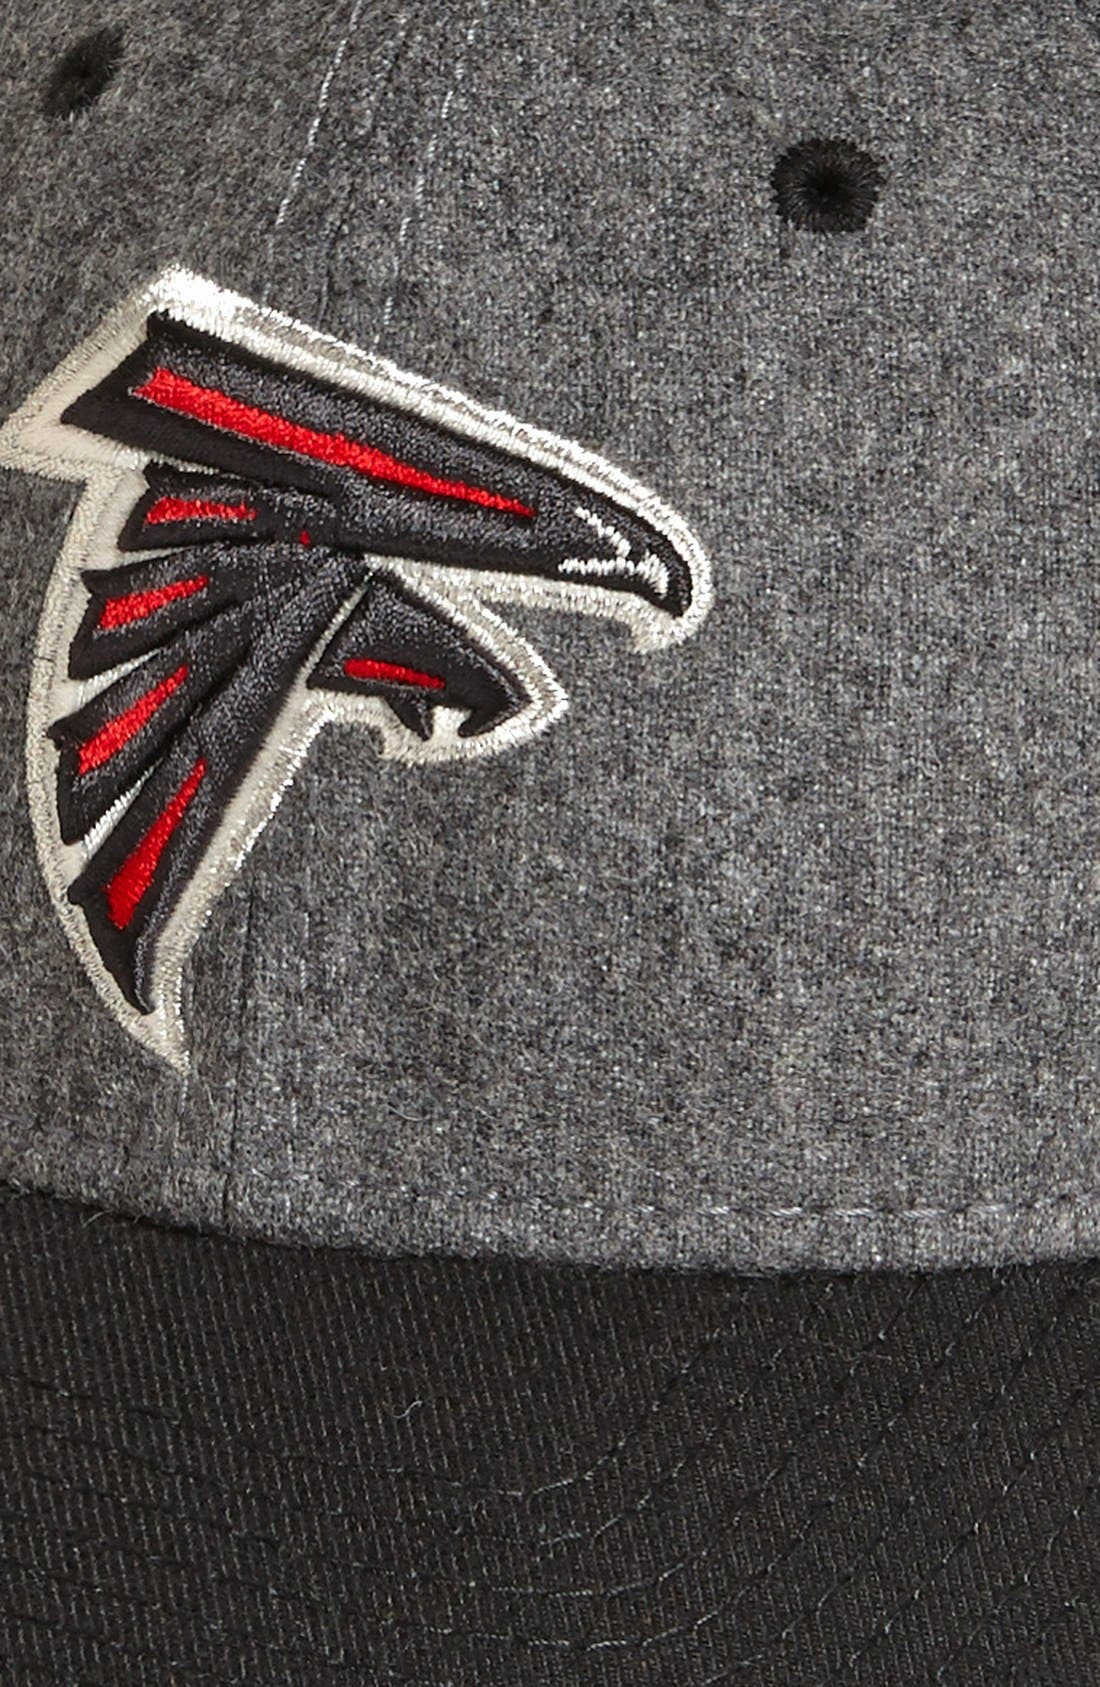 'Meltop - Atlanta Falcons' Fitted Baseball Cap,                             Alternate thumbnail 4, color,                             021